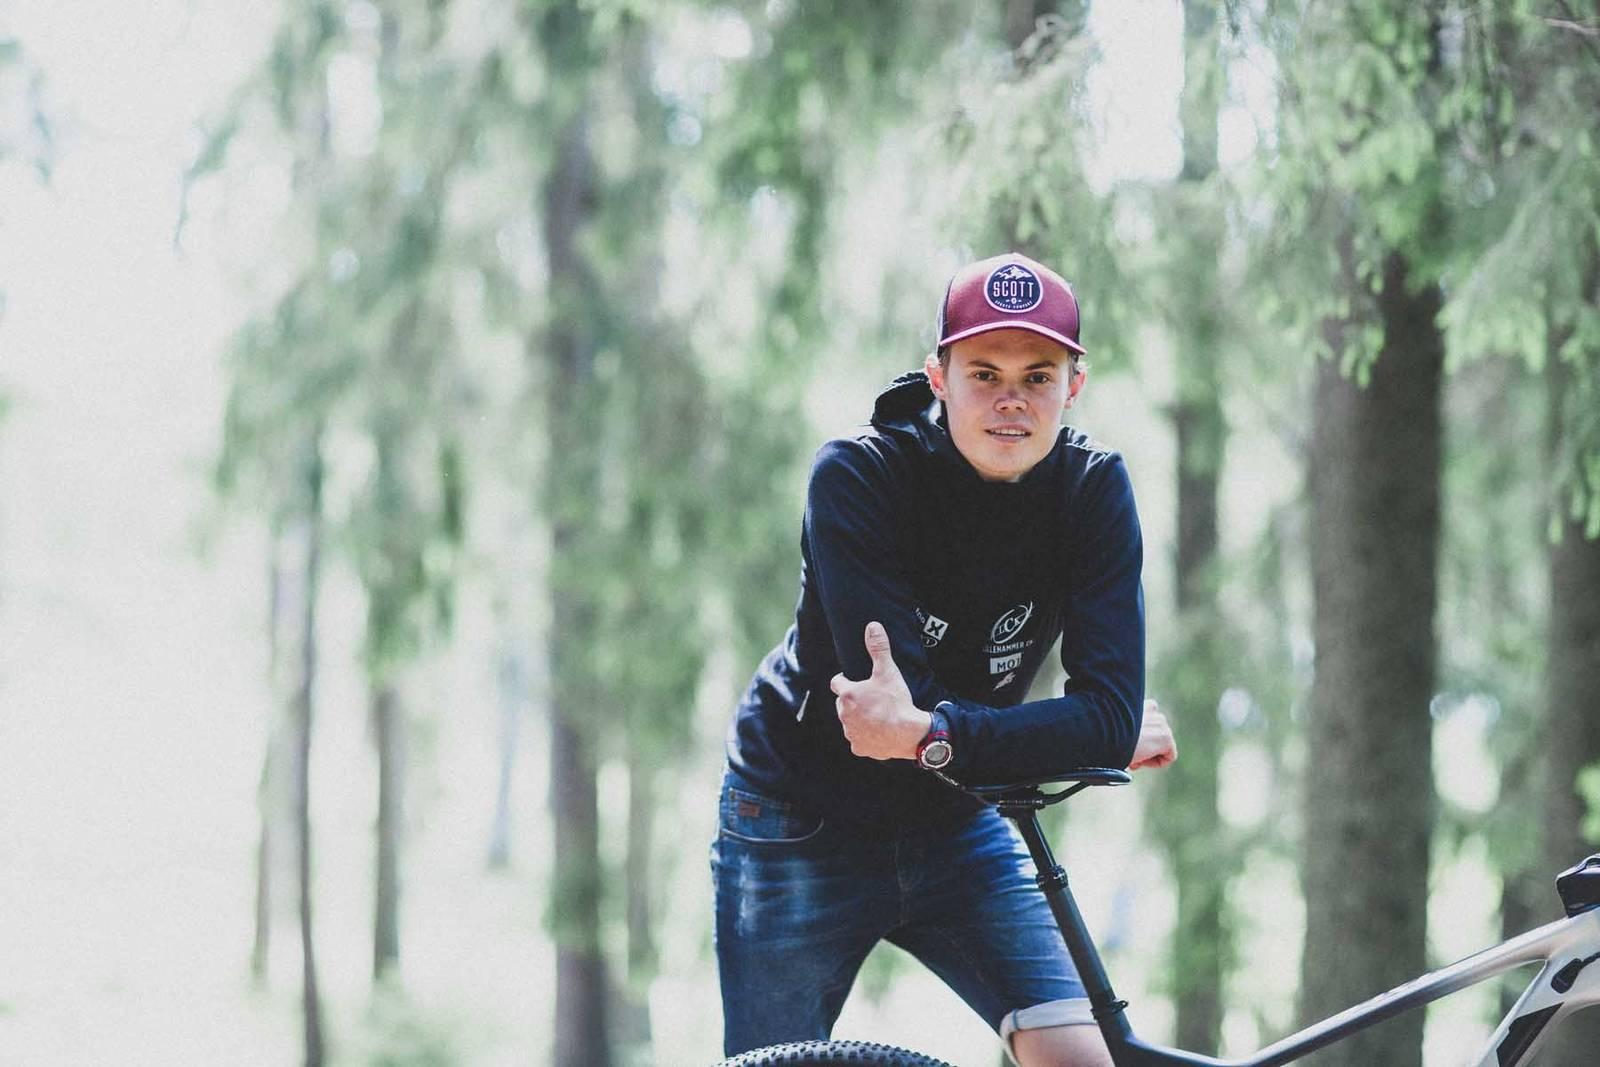 erik hægstad intervju 2020 terrengsykkel